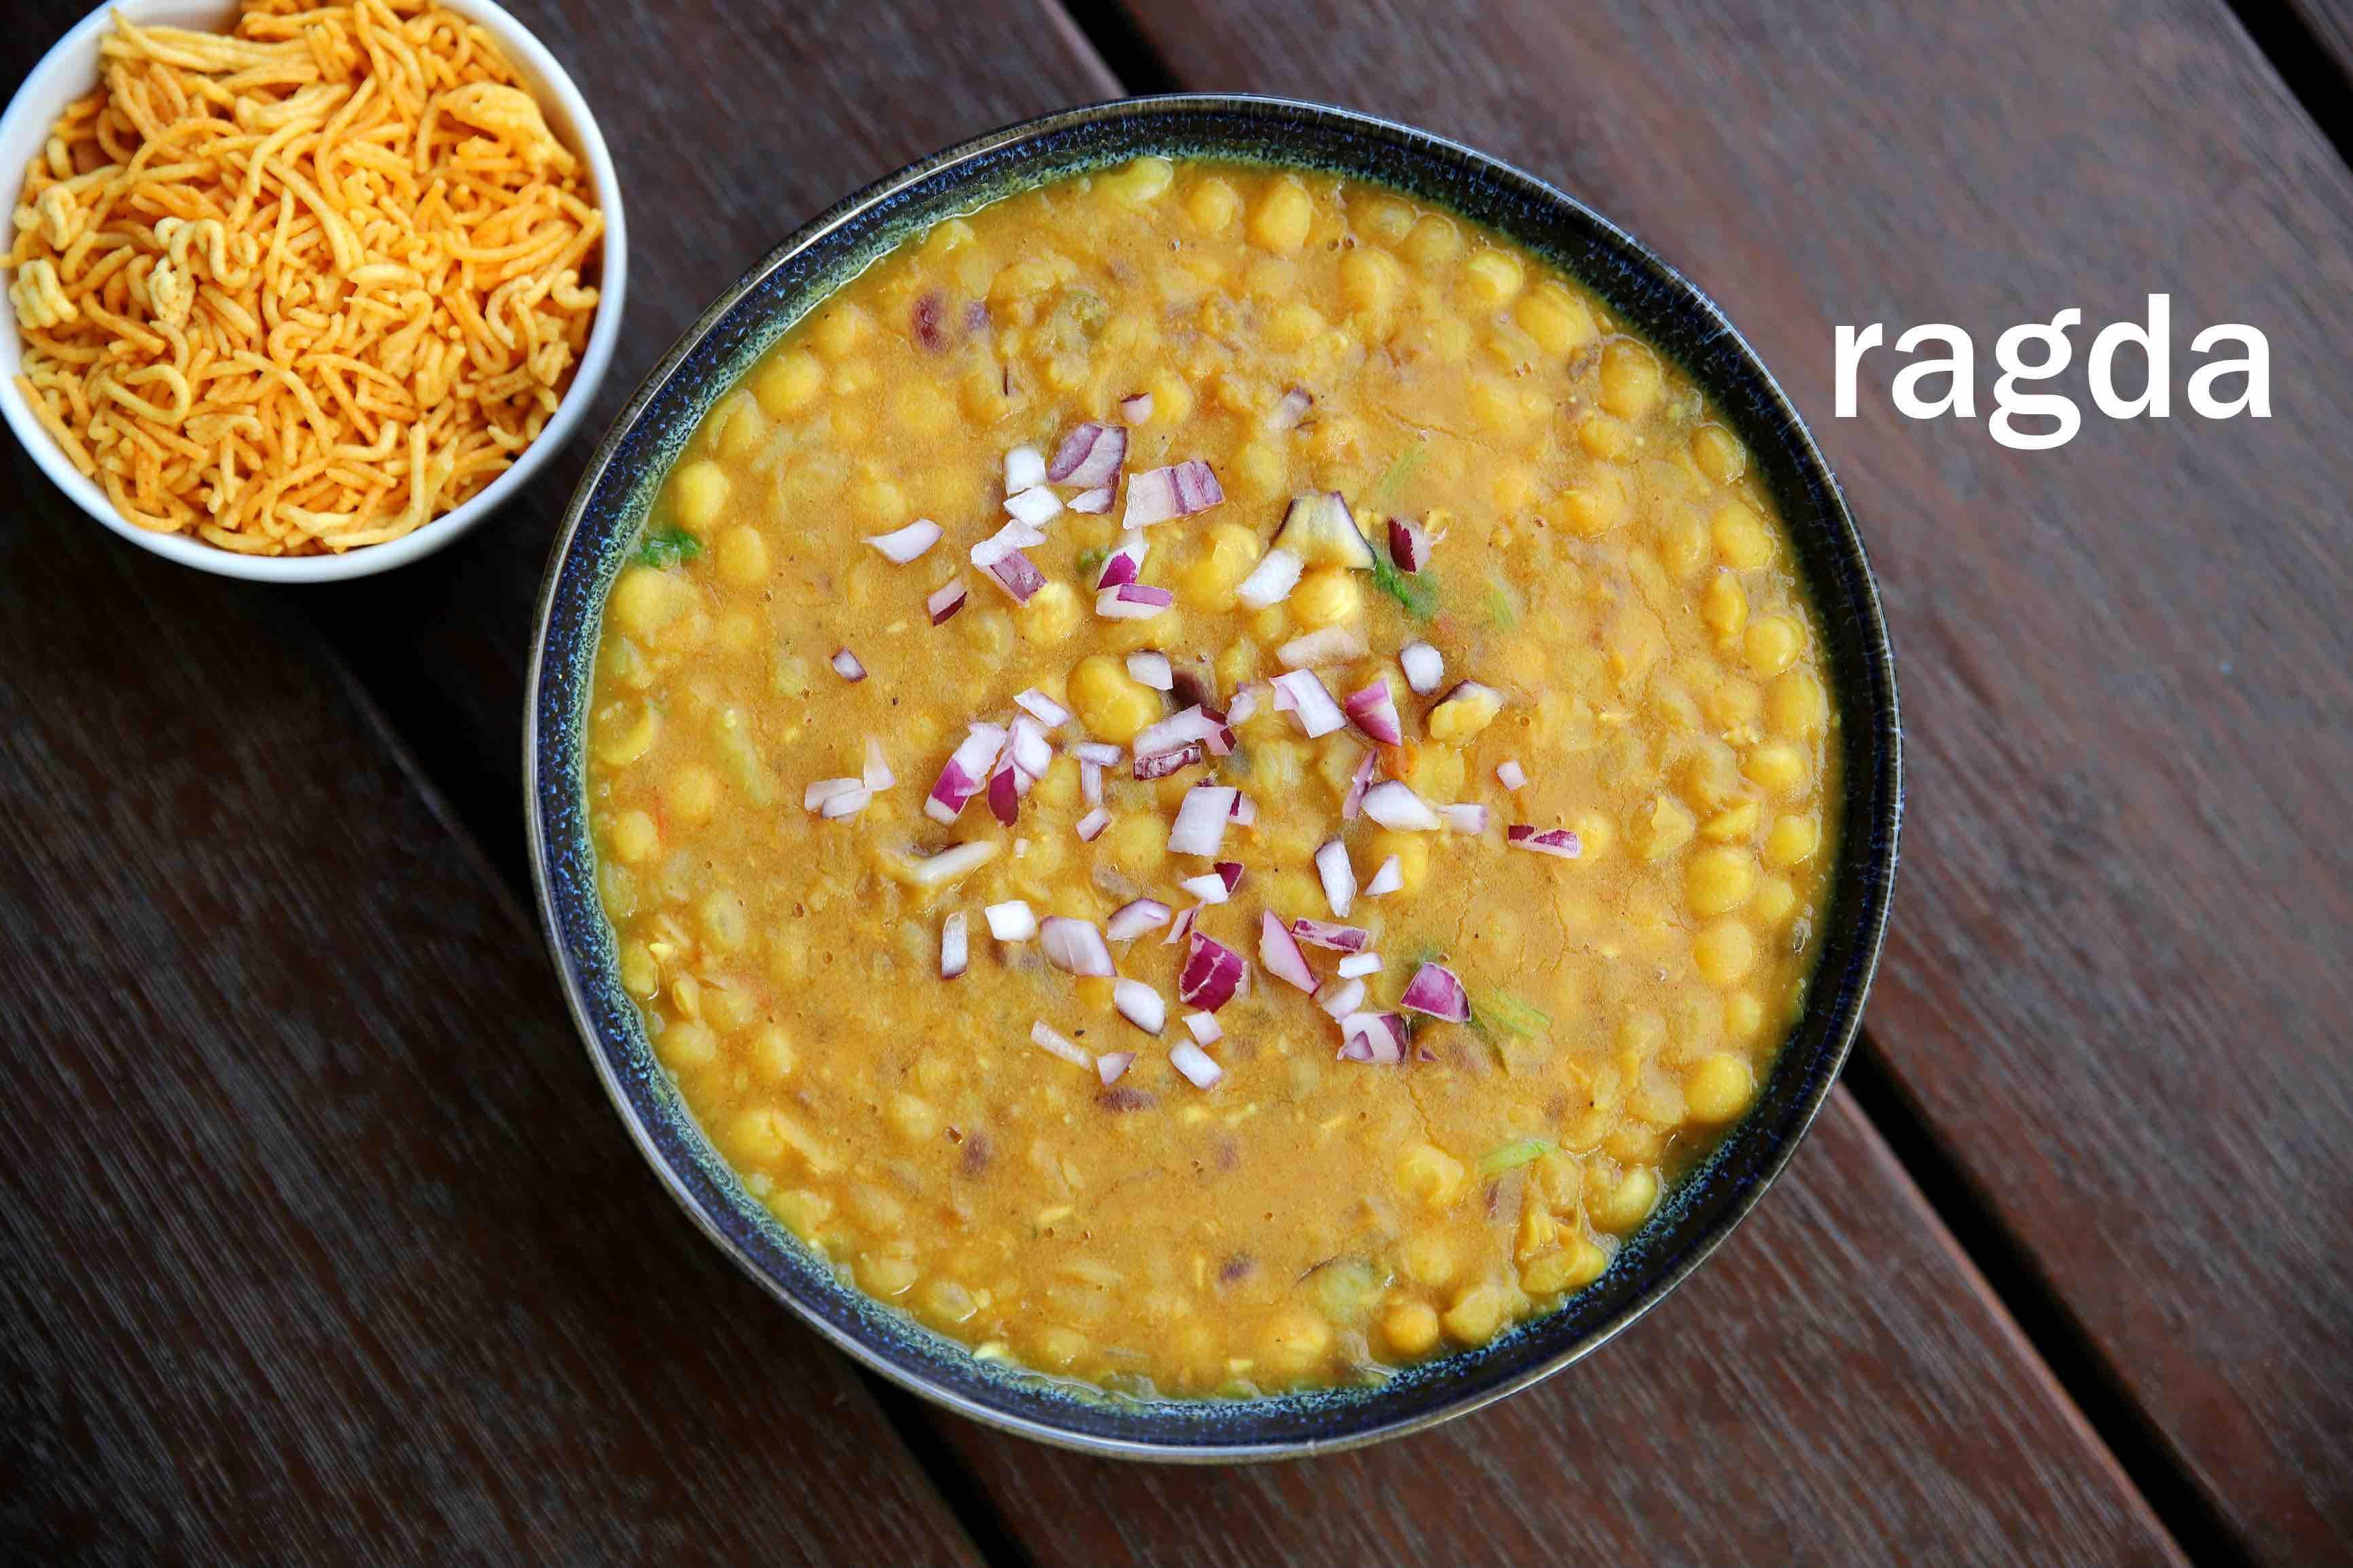 ragda recipe how to make ragda for ragda patties ragda for chaat recipes recipe chaat on hebbar s kitchen chicken biryani id=97233